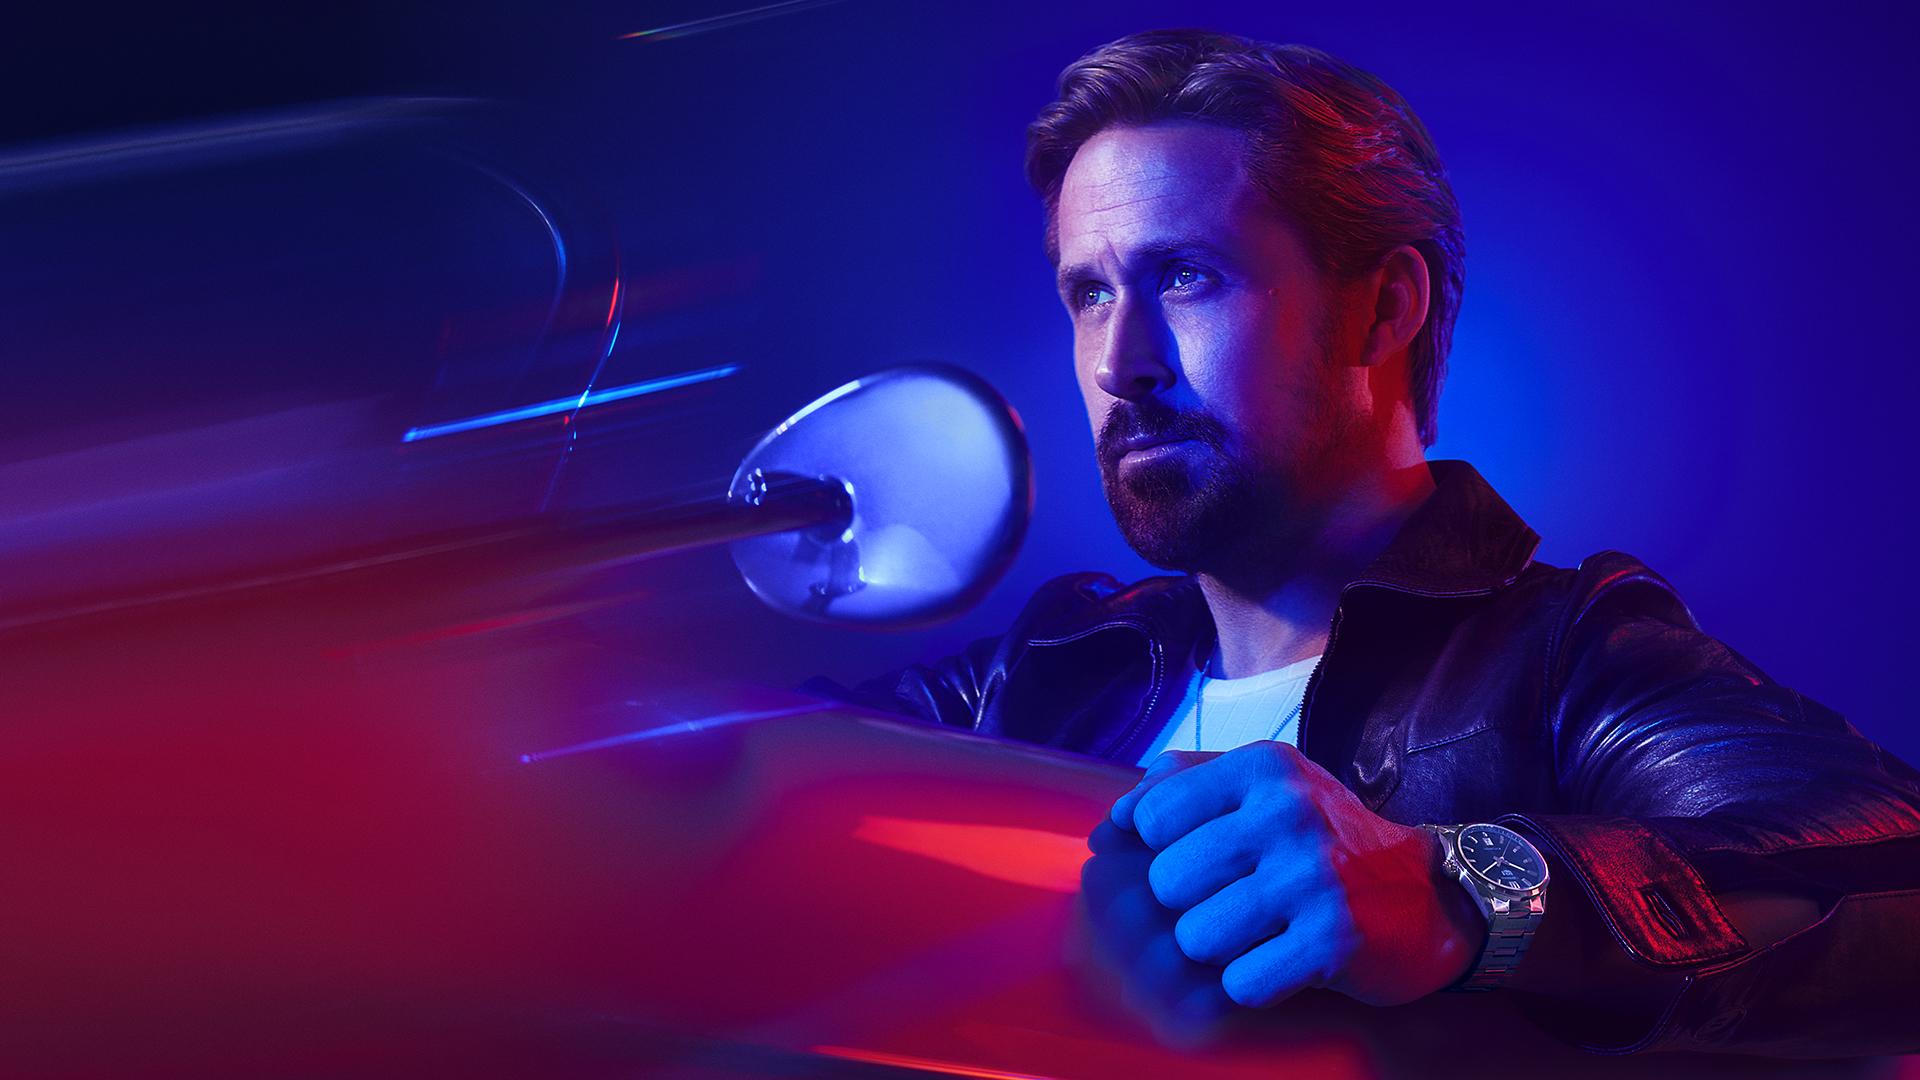 Ryan Gosling 4